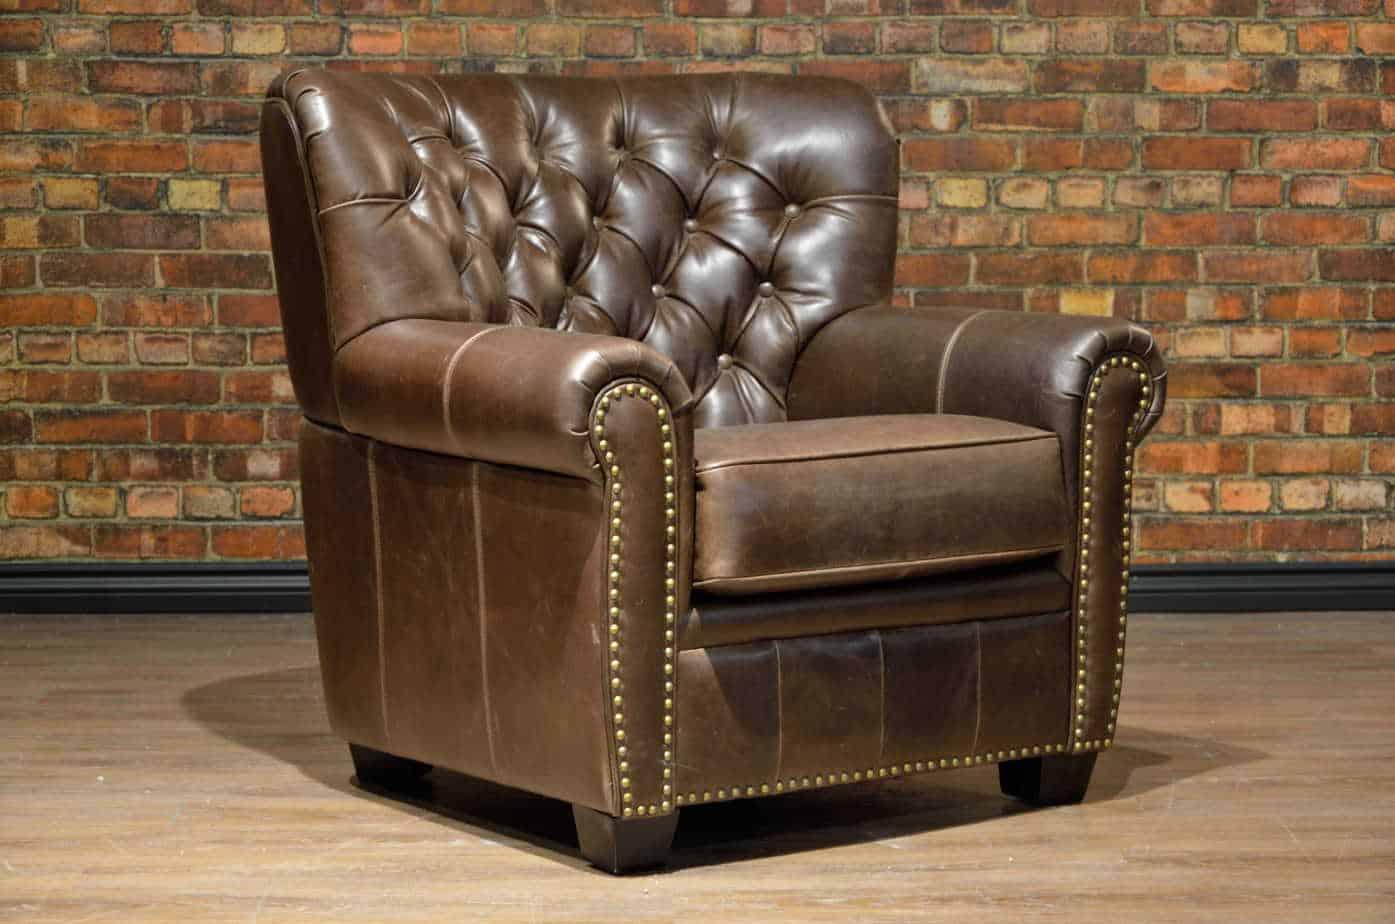 Miraculous Gci Outdoor Slim Fold Directors Chair And Xpress Lounger Review Frankydiablos Diy Chair Ideas Frankydiabloscom